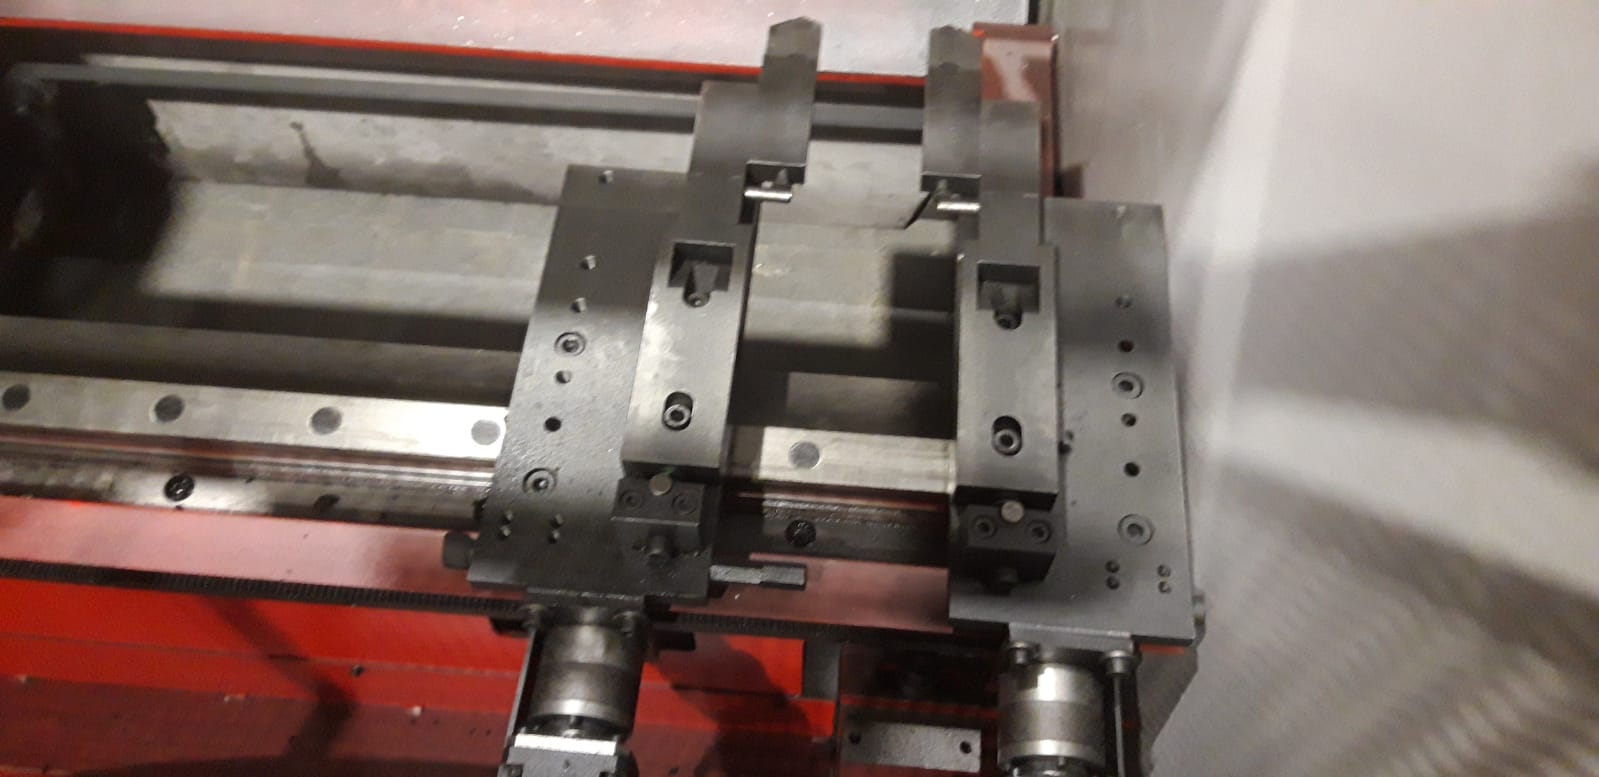 Pressa piegatrice idraulica Beyeler pr6 60/20 in vendita - foto 2